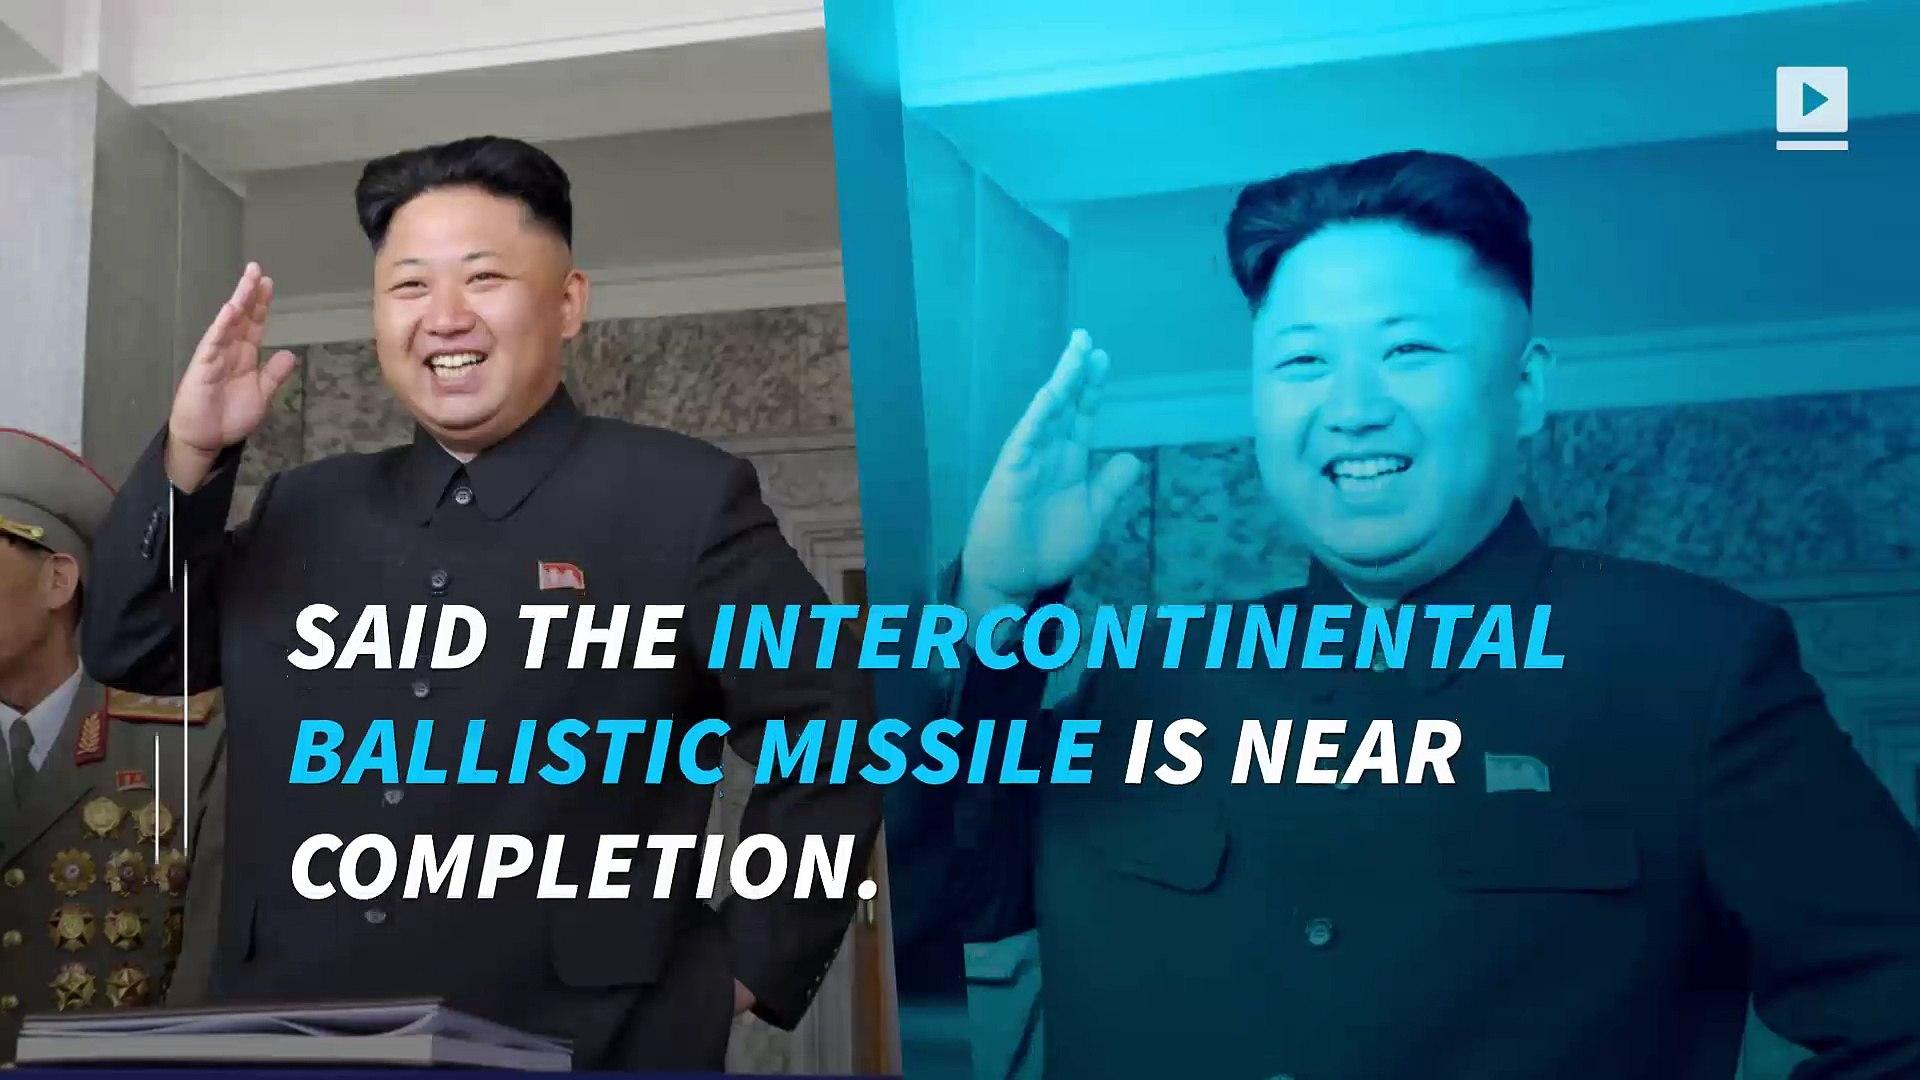 Trump: North Korea nuclear strike 'won't happen'